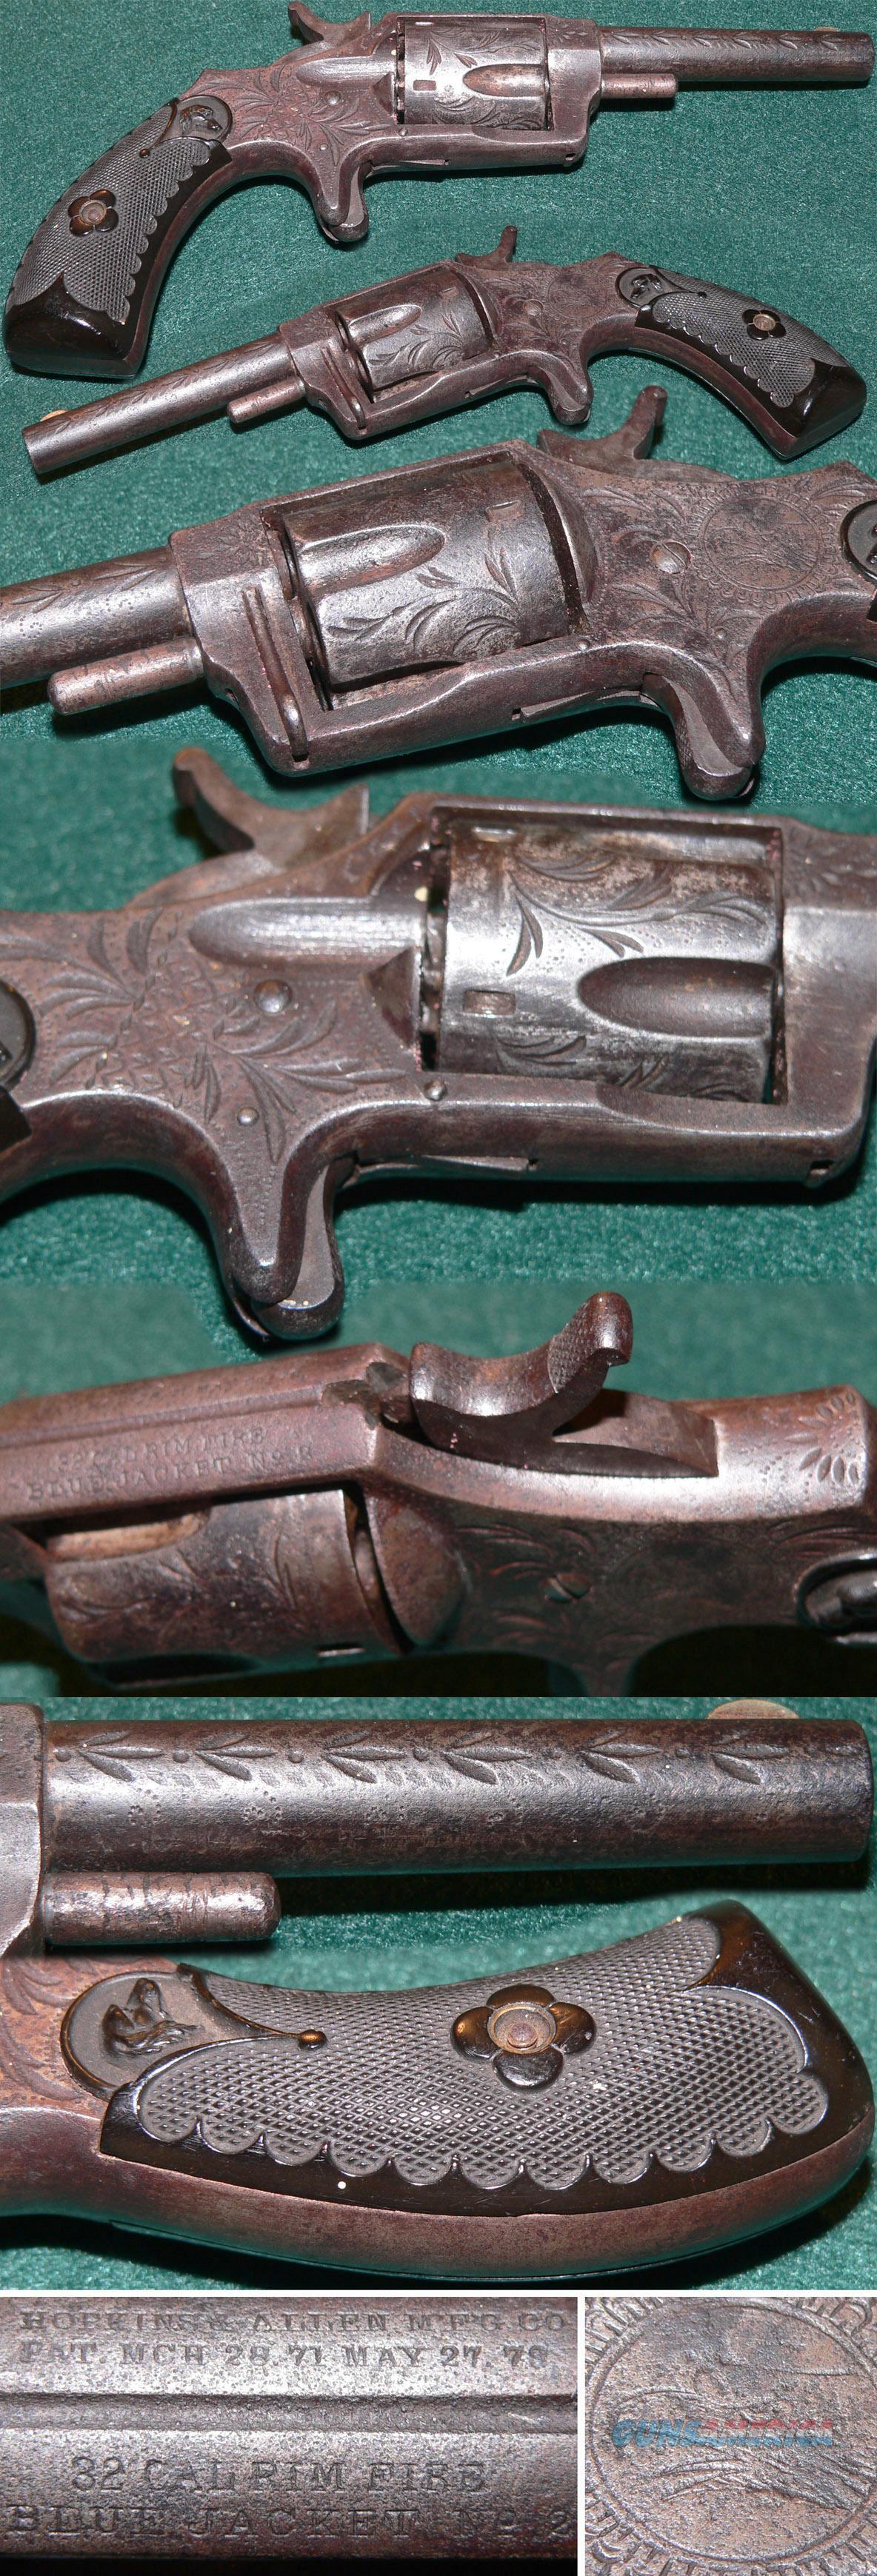 "Hopkins & Allen Blue Jacket revolver engraved with ""screaming eagle""  Guns > Pistols > Antique (Pre-1899) Pistols - Ctg. Misc."